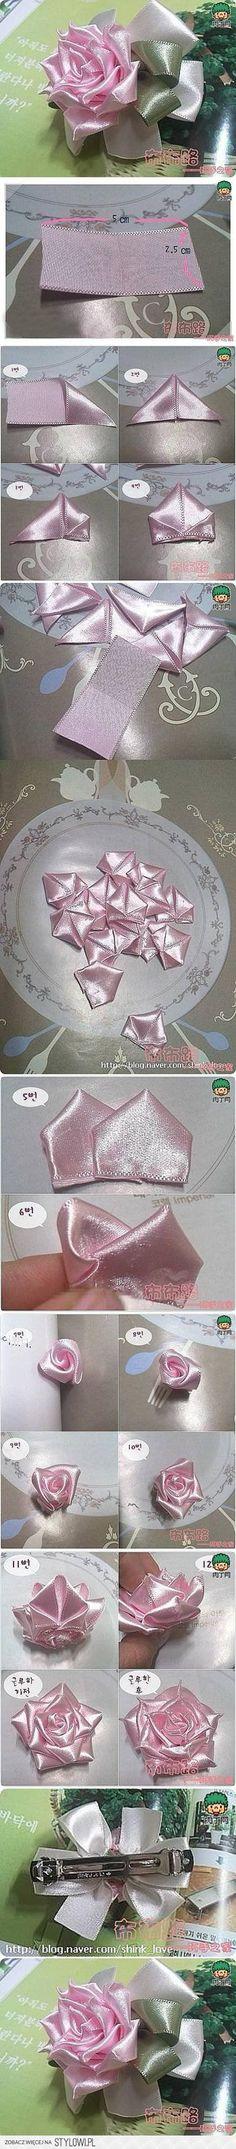 DIY Easy Satin Ribbon Rose Hairpin DIY Projects | Usefu… na Stylowi.pl